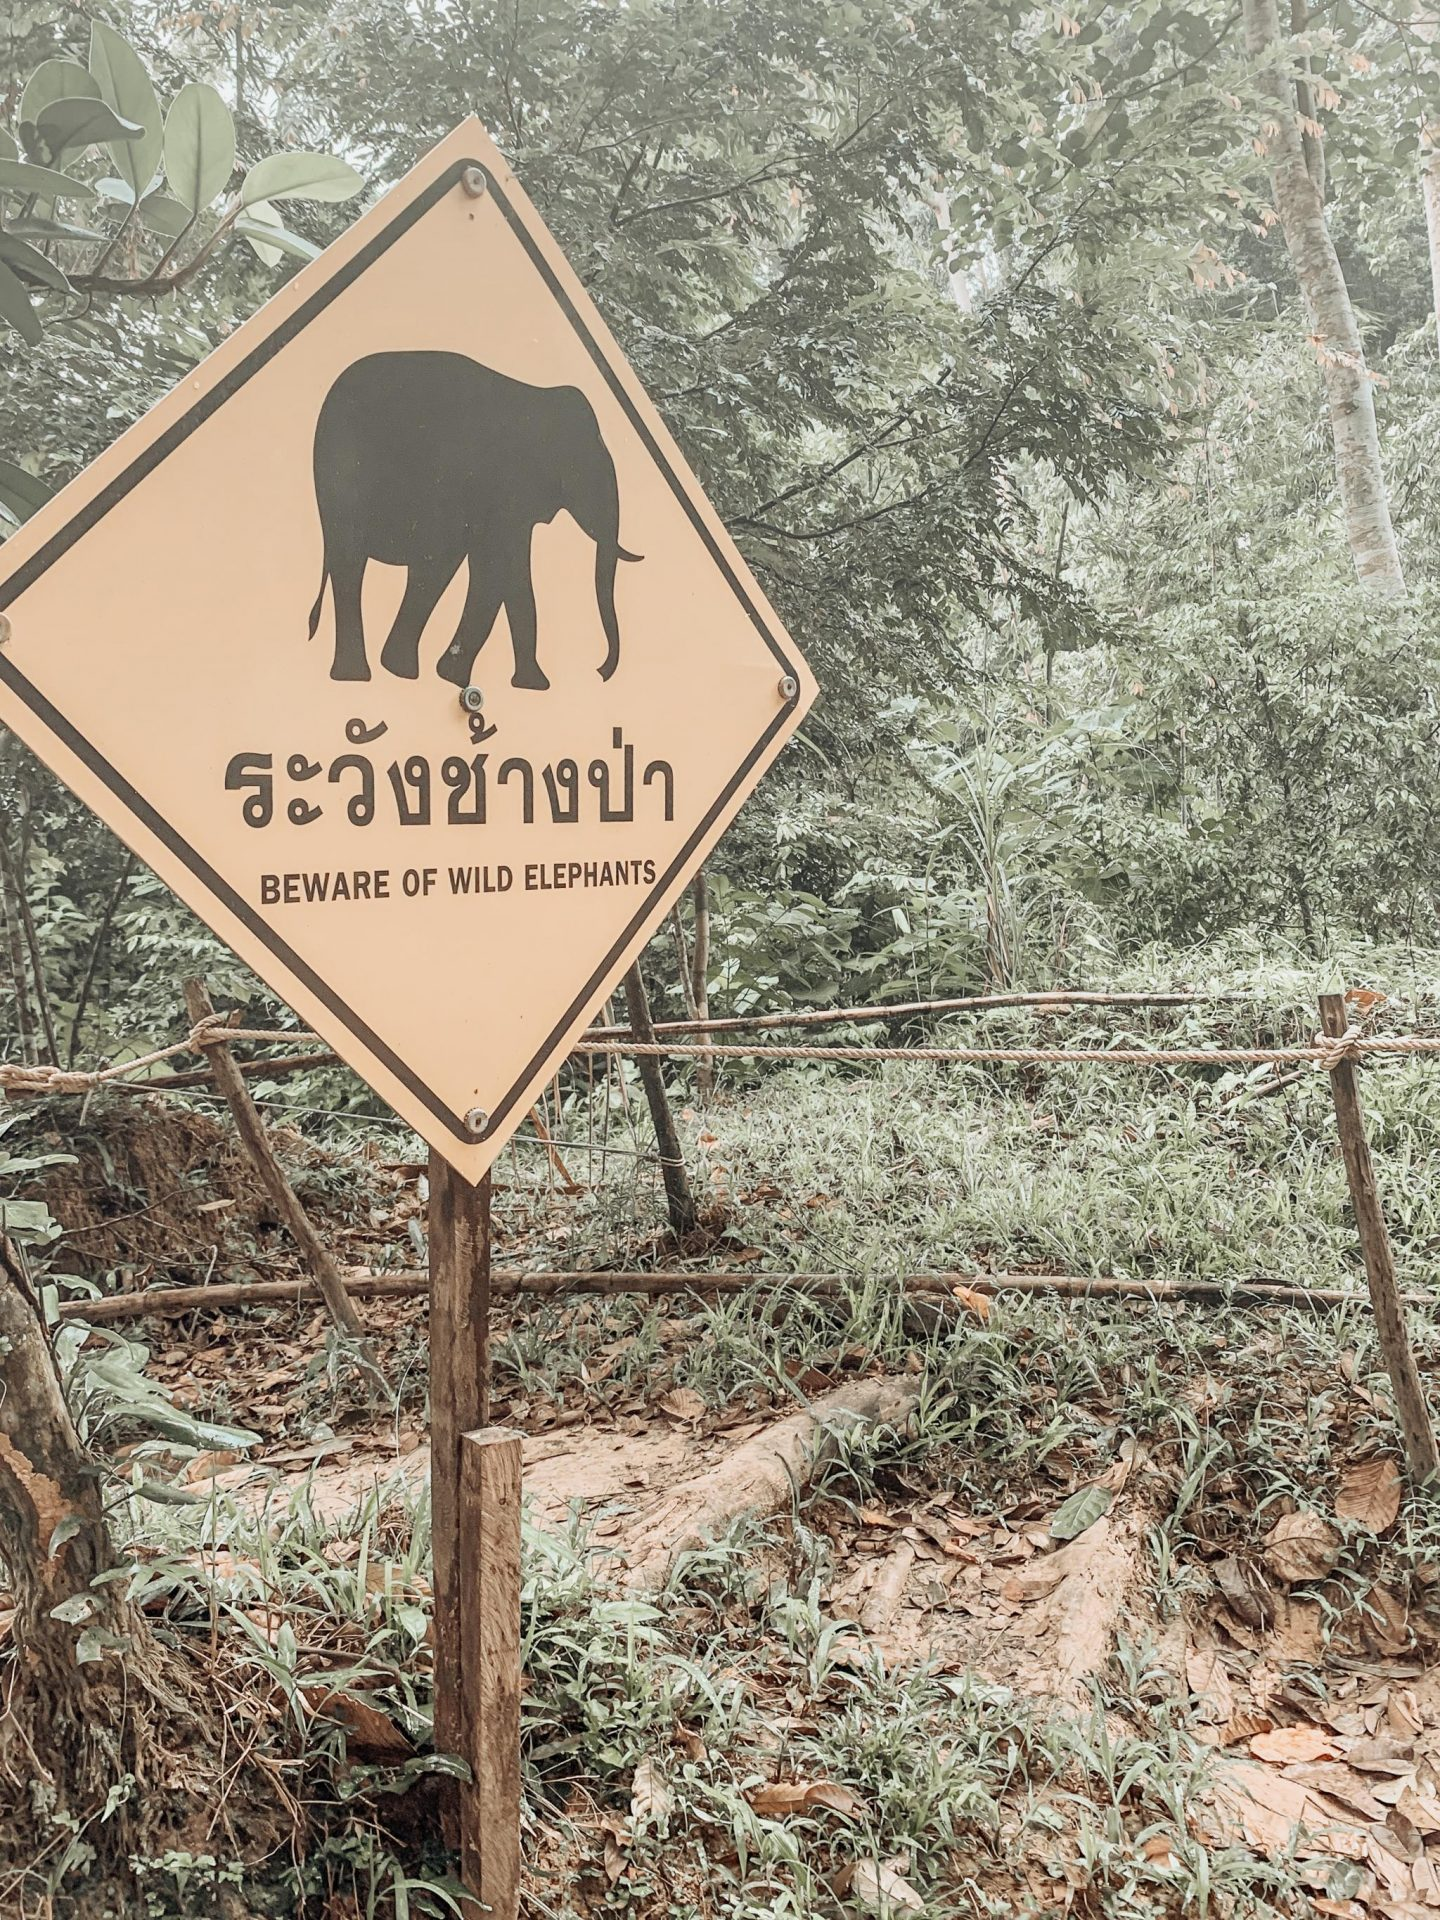 Beware of Wild Elephants signpost in the Khao Sok rainforest